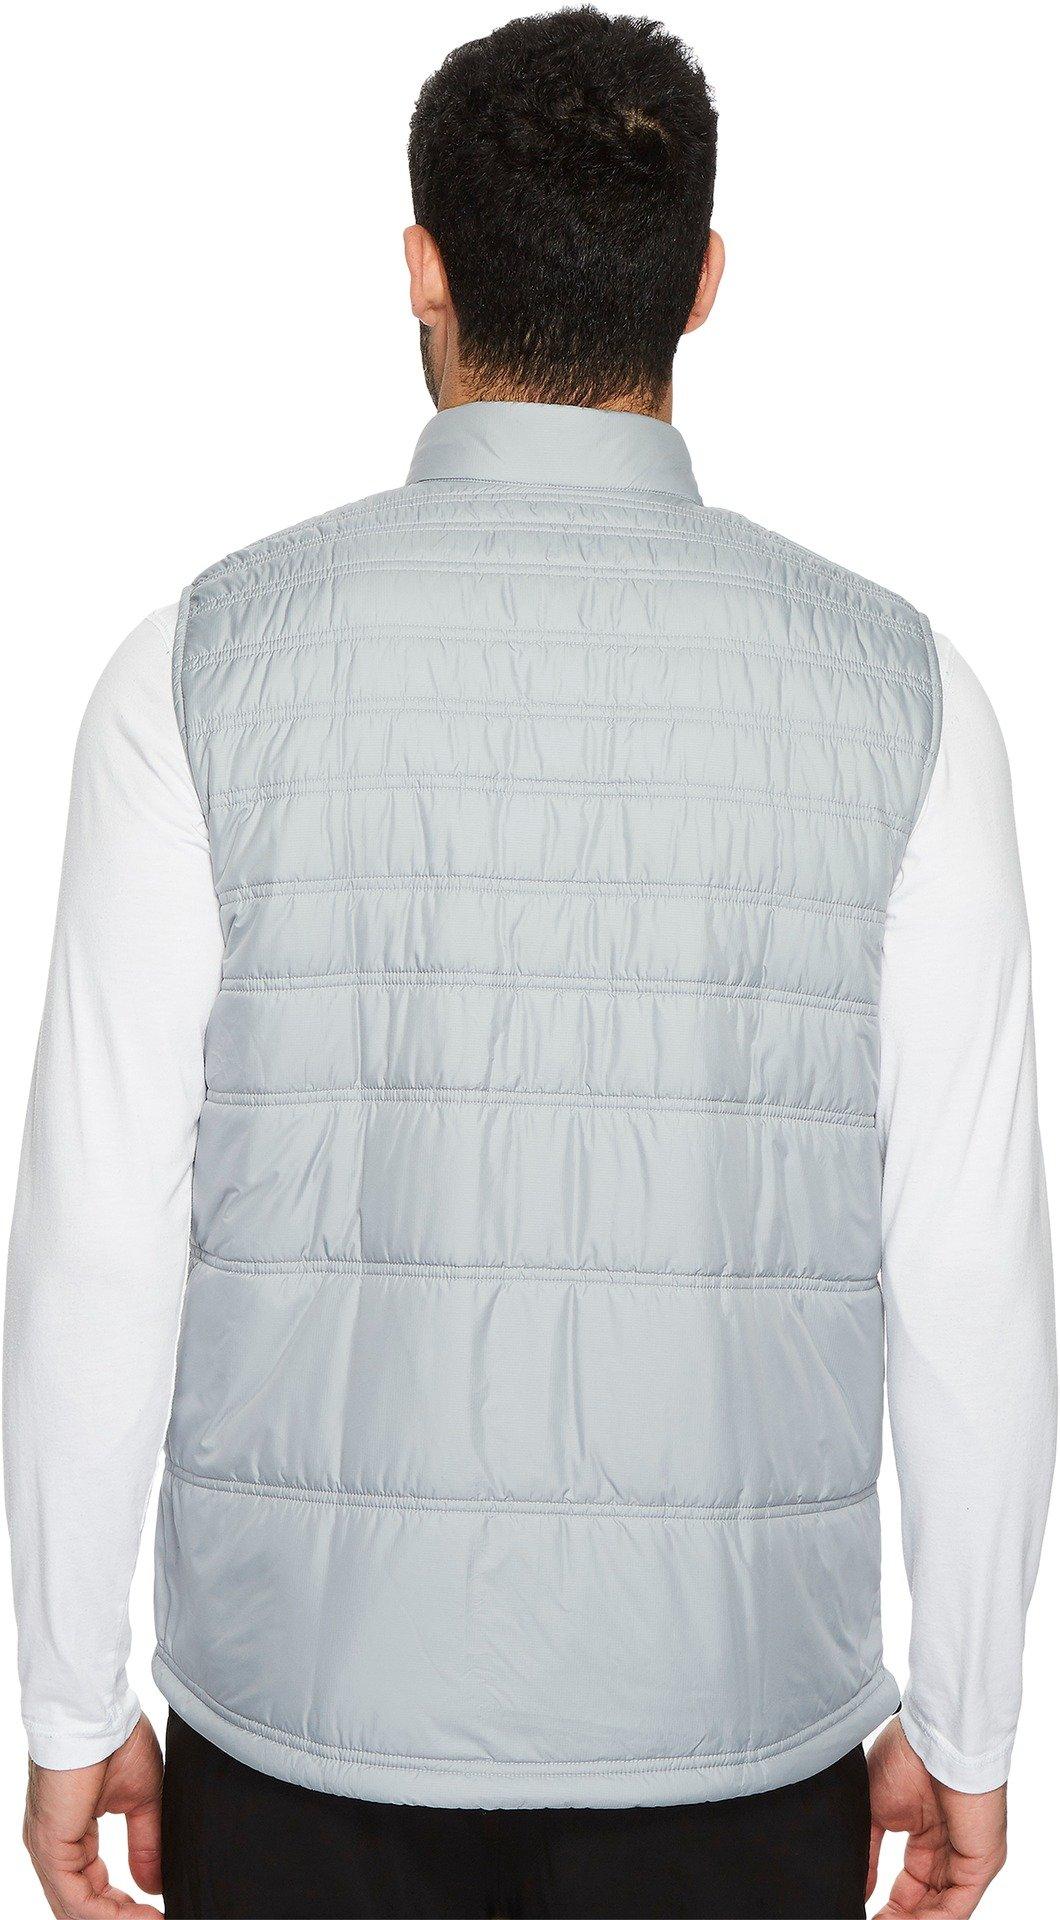 adidas Golf Men's Climaheat Primaloft Full Zip Vest, Mid Grey, XX-Large by adidas (Image #2)